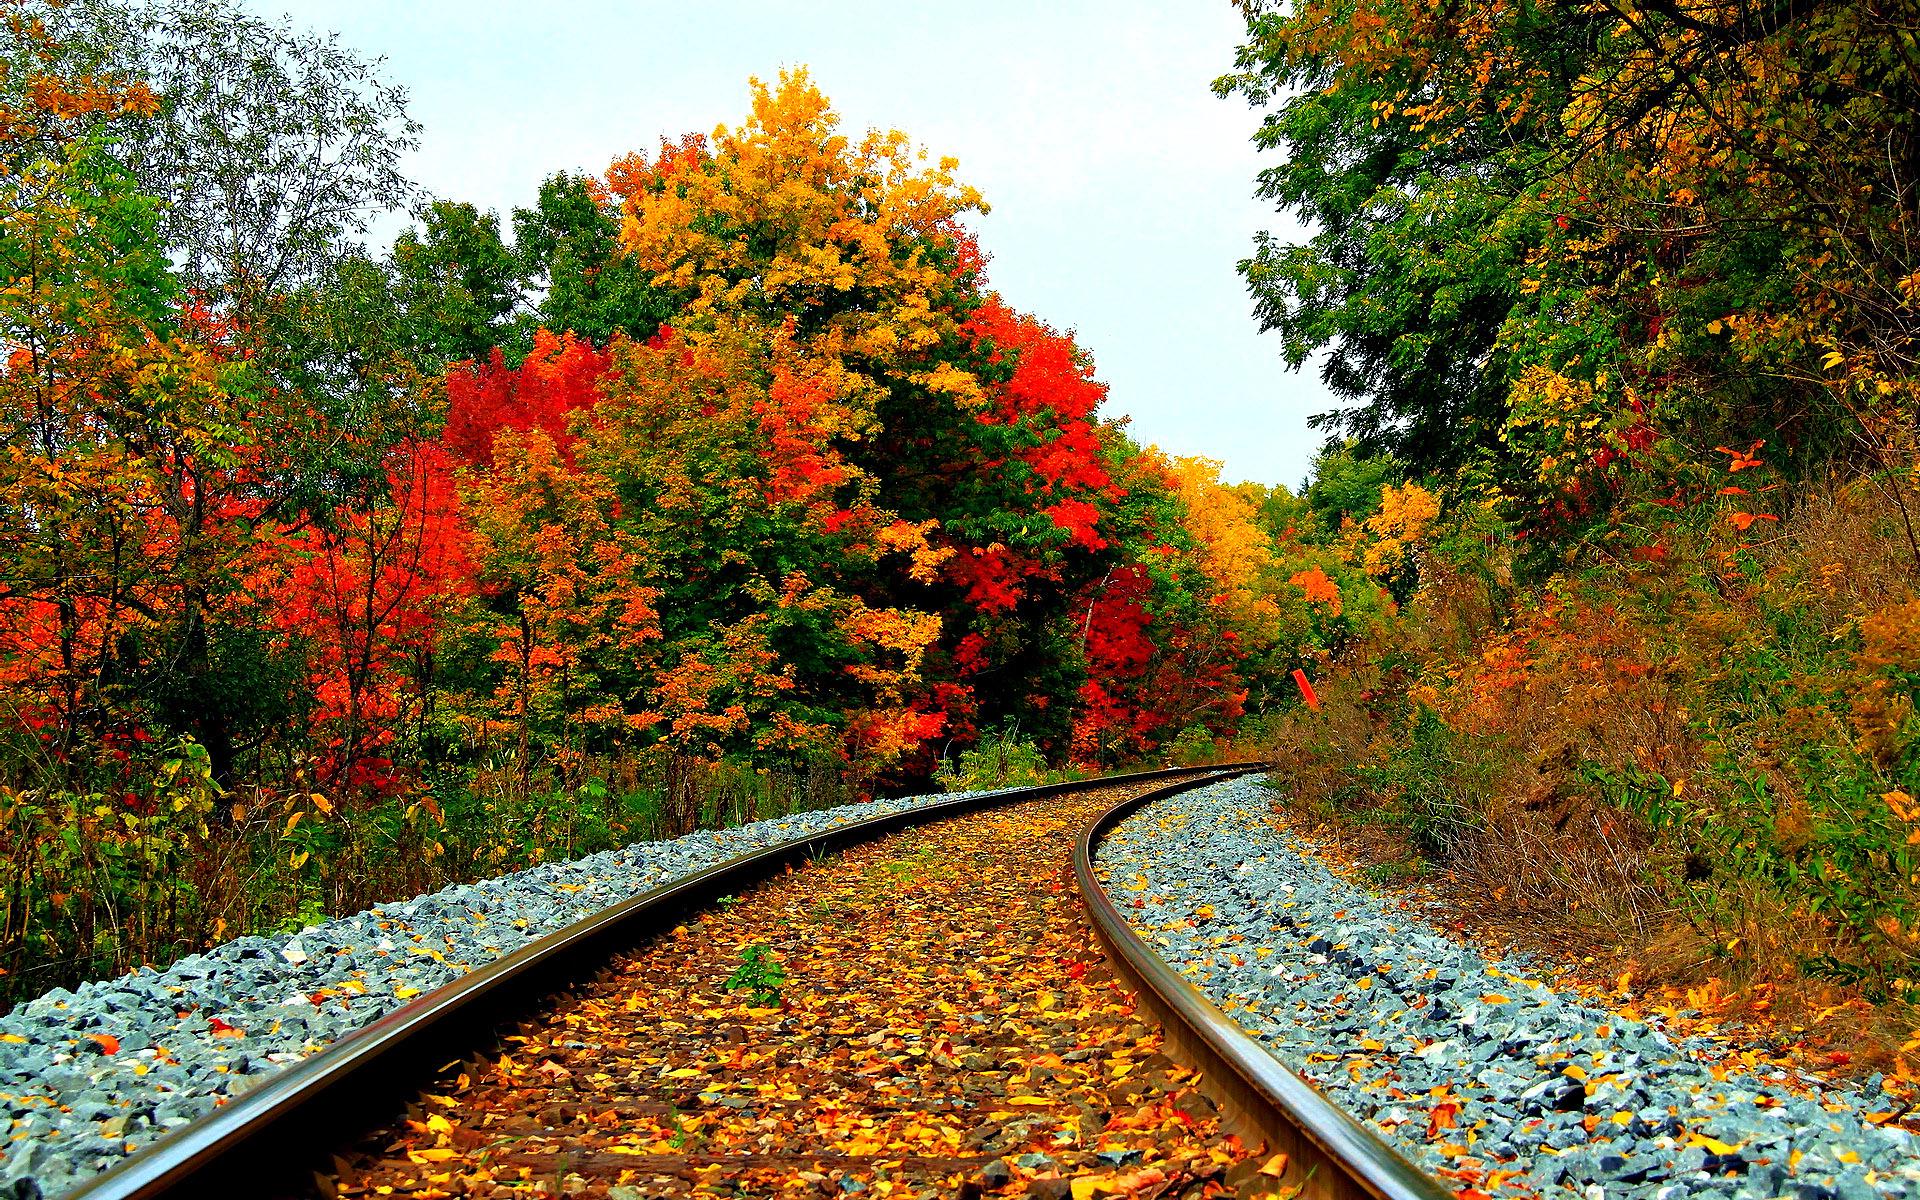 Железная дорога, лес, природа, обои hd, картинка фон осень